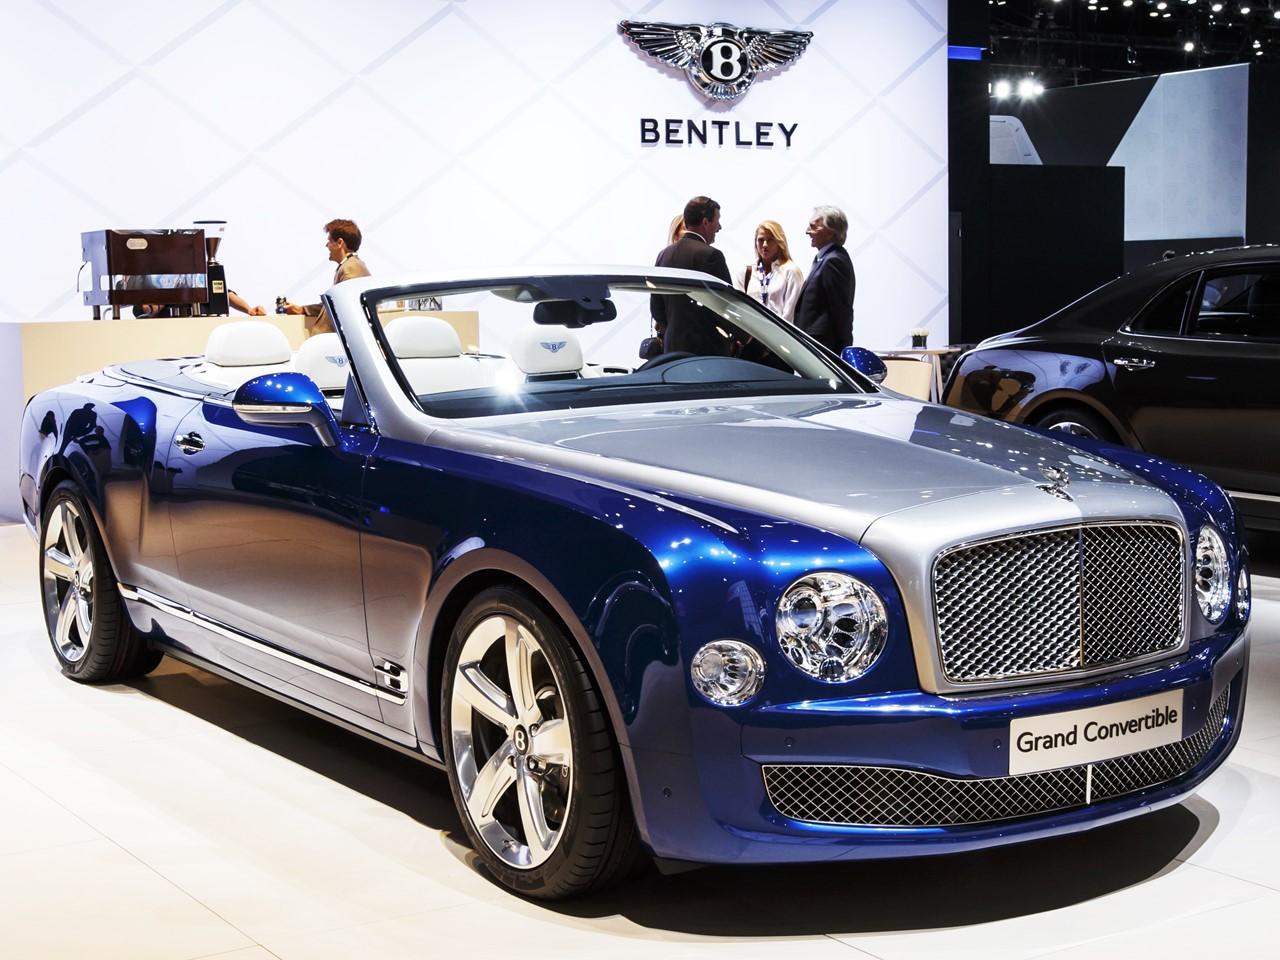 Bentley Grand Convertible Concept   NotoriousLuxury